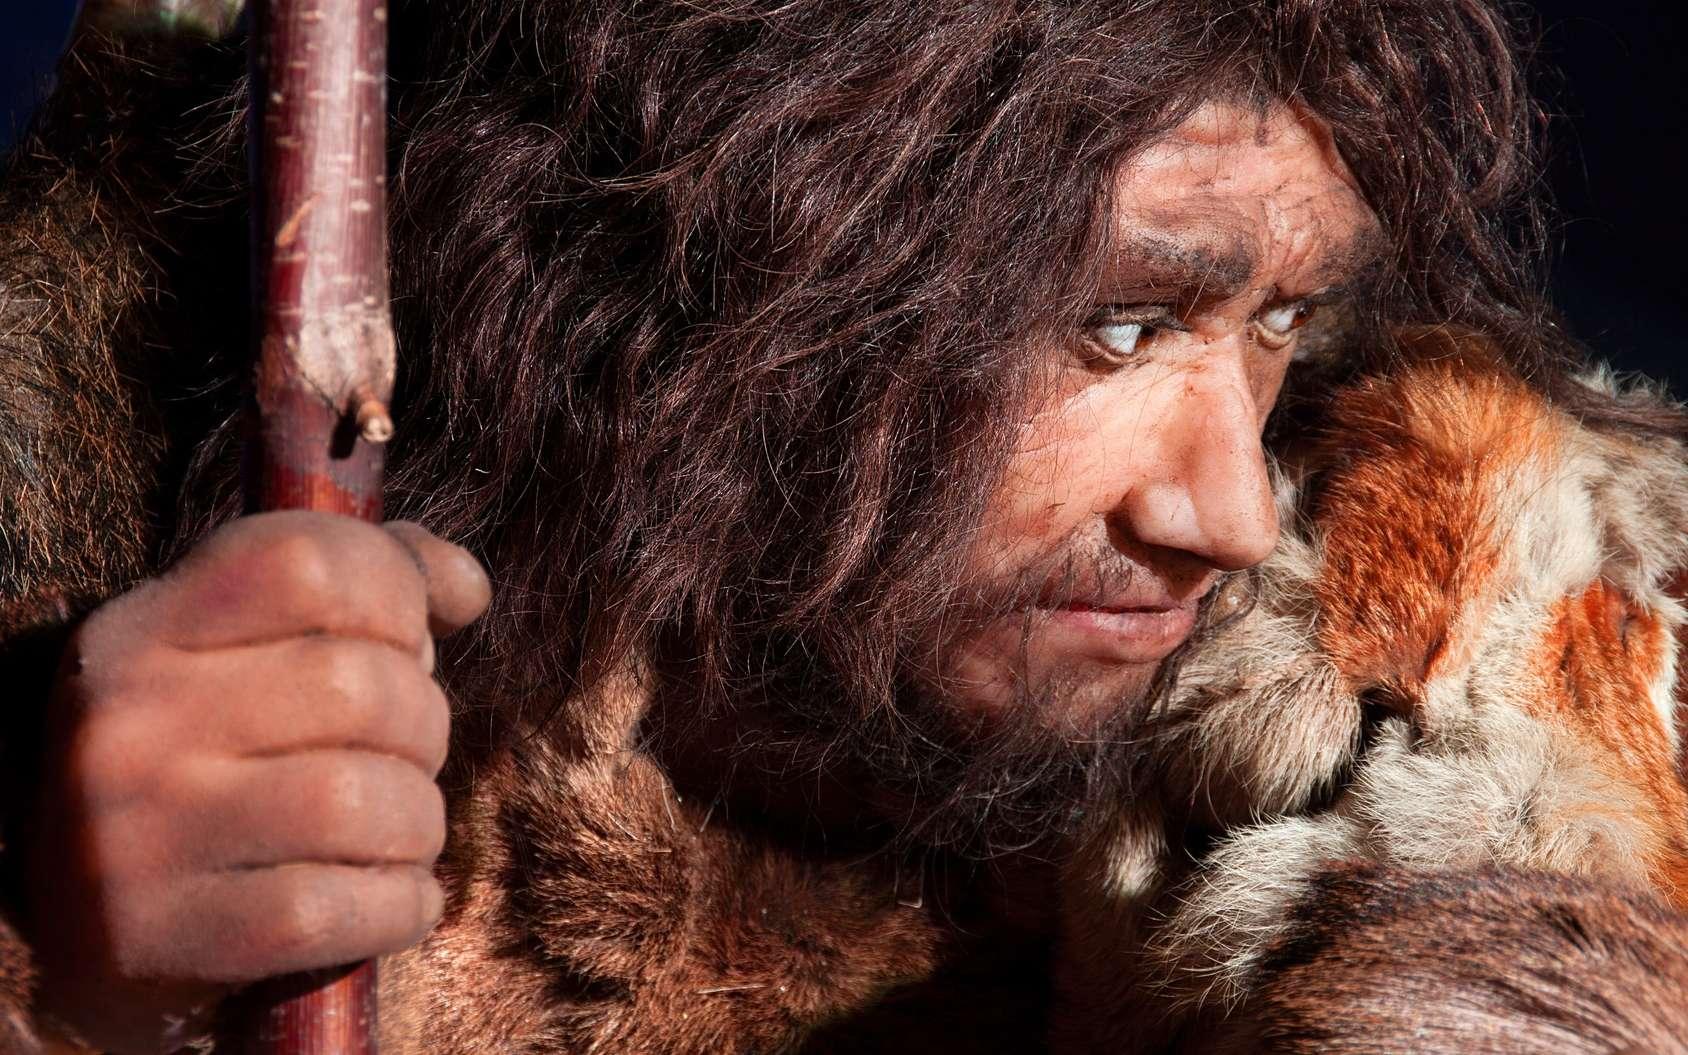 Les micro-organismes intestinaux que nous avons en commun avec Néandertal - Futura